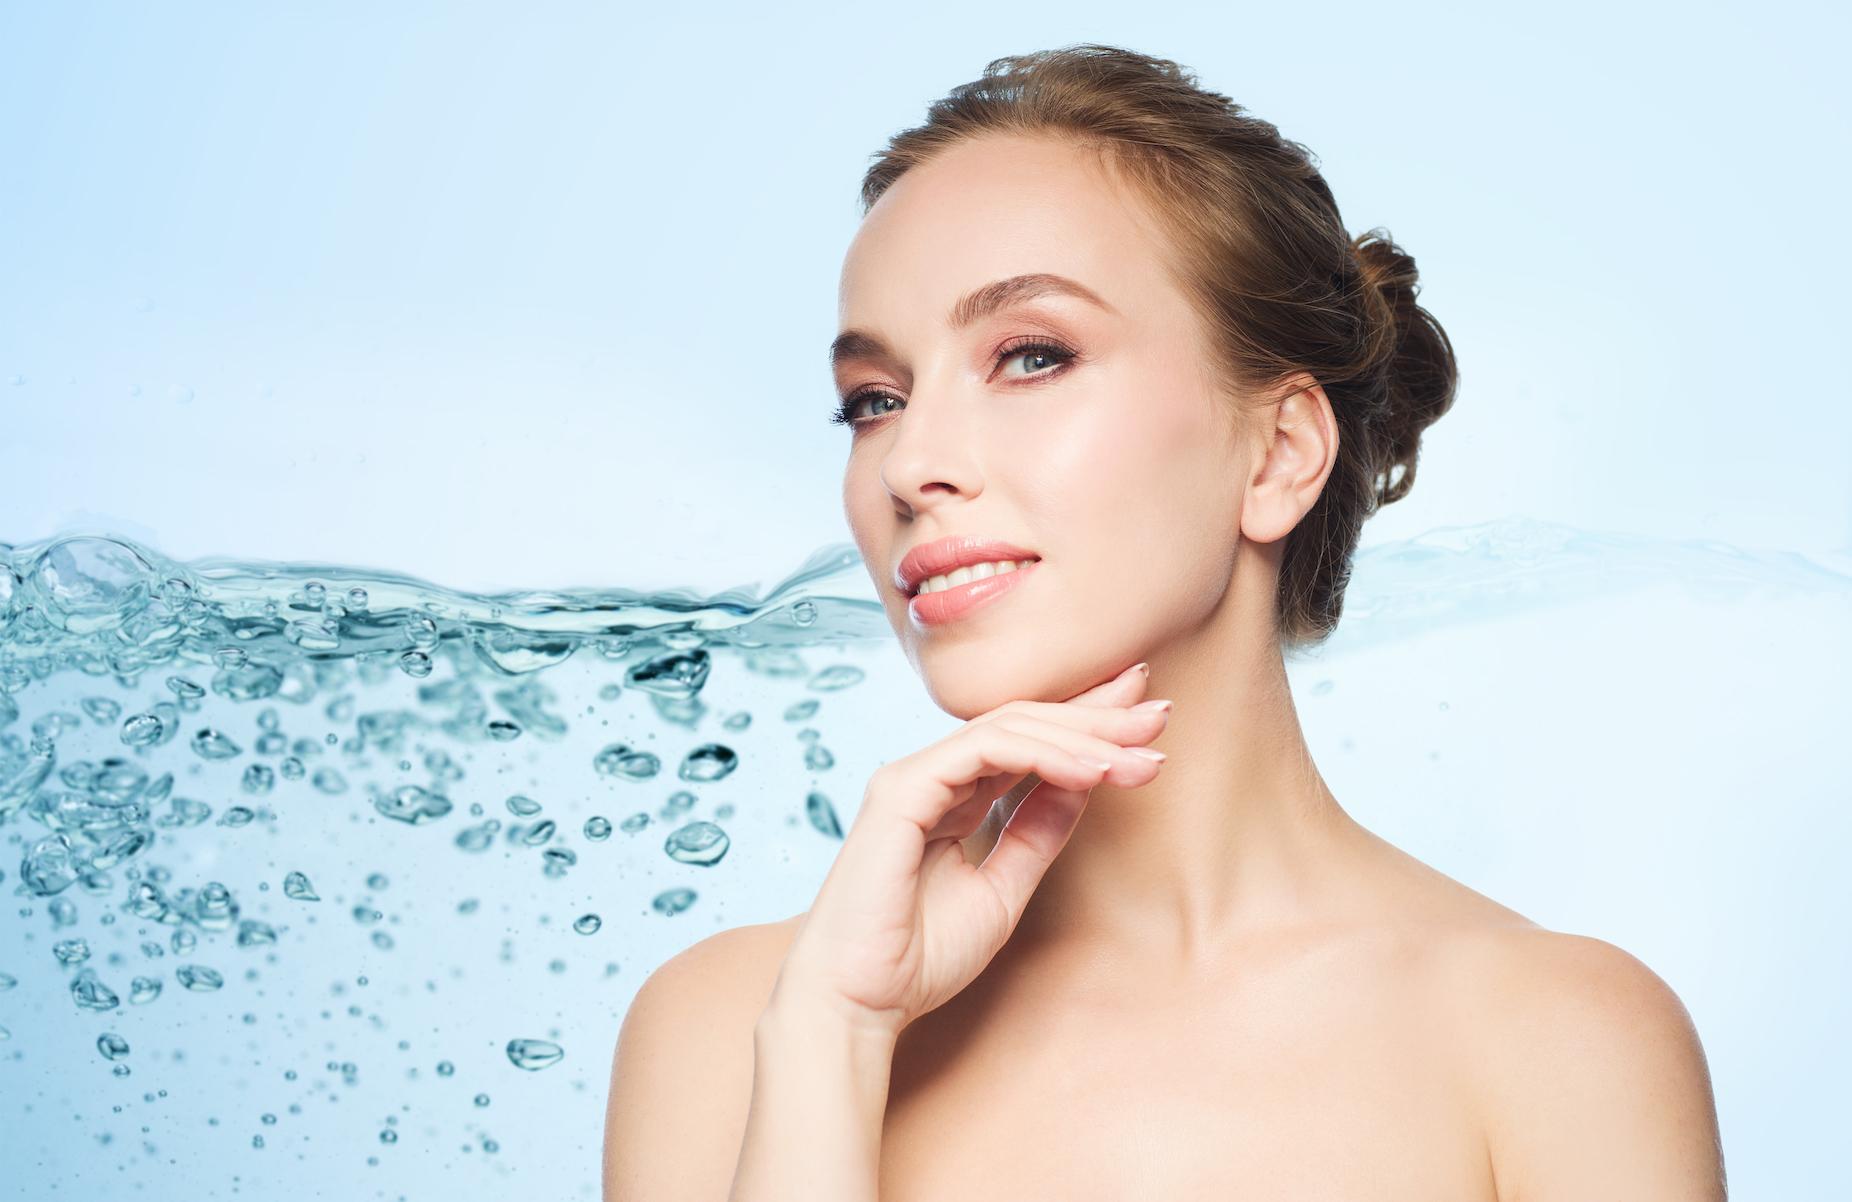 Secret Beauty Club Let's Look at Hyaluronic Acid